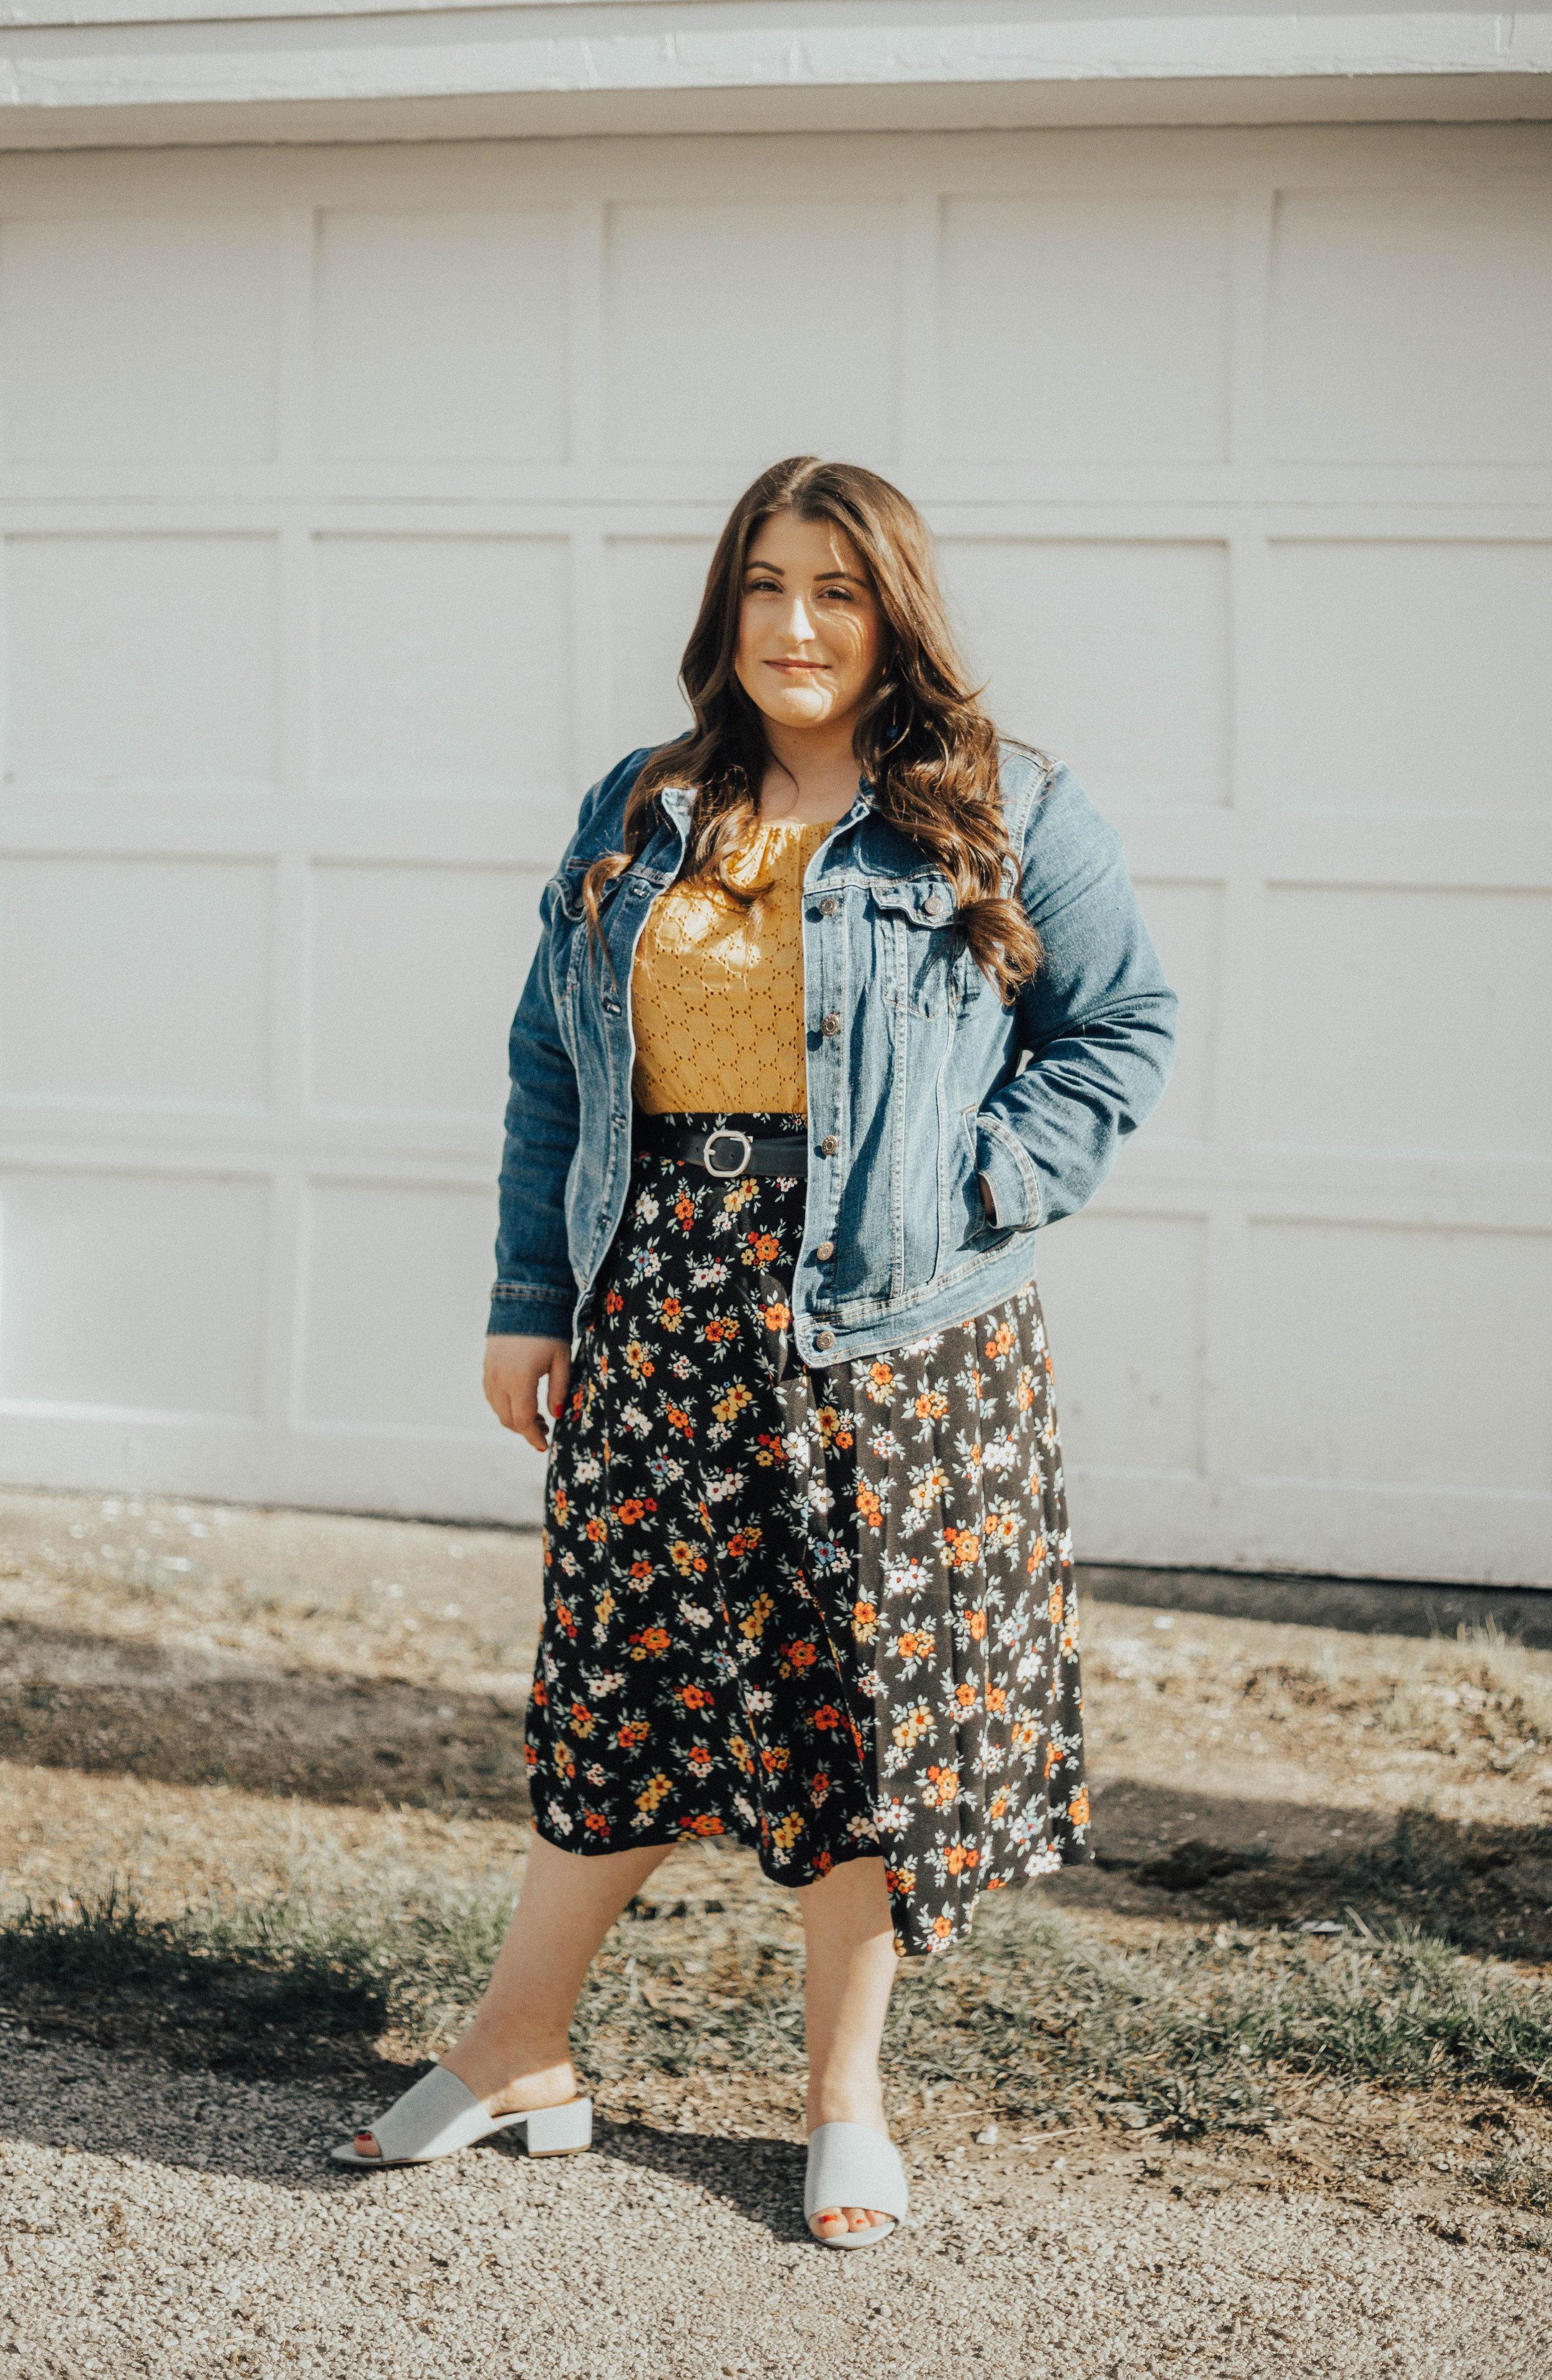 Outfit details: Skirt// Joanie Clothing  Top// Target  Jean Jacket// Old Navy  Earrings// Target  Slides//Old,  Similar